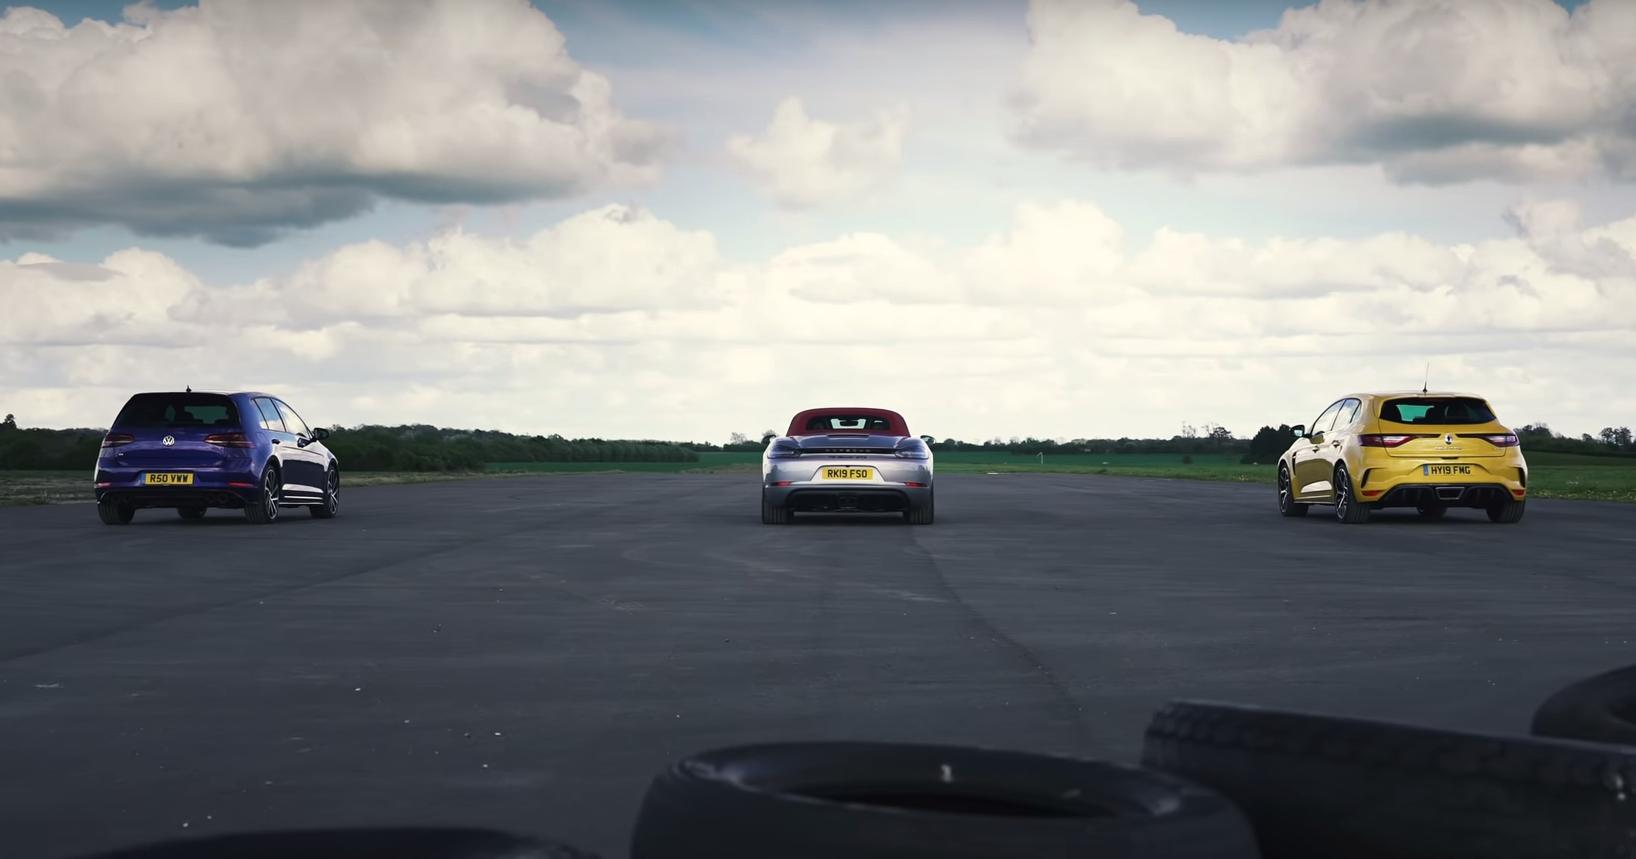 VW Golf R, Porsche Boxster GTS  и Reanaultsport Megane Trophy: дрэг-гонка